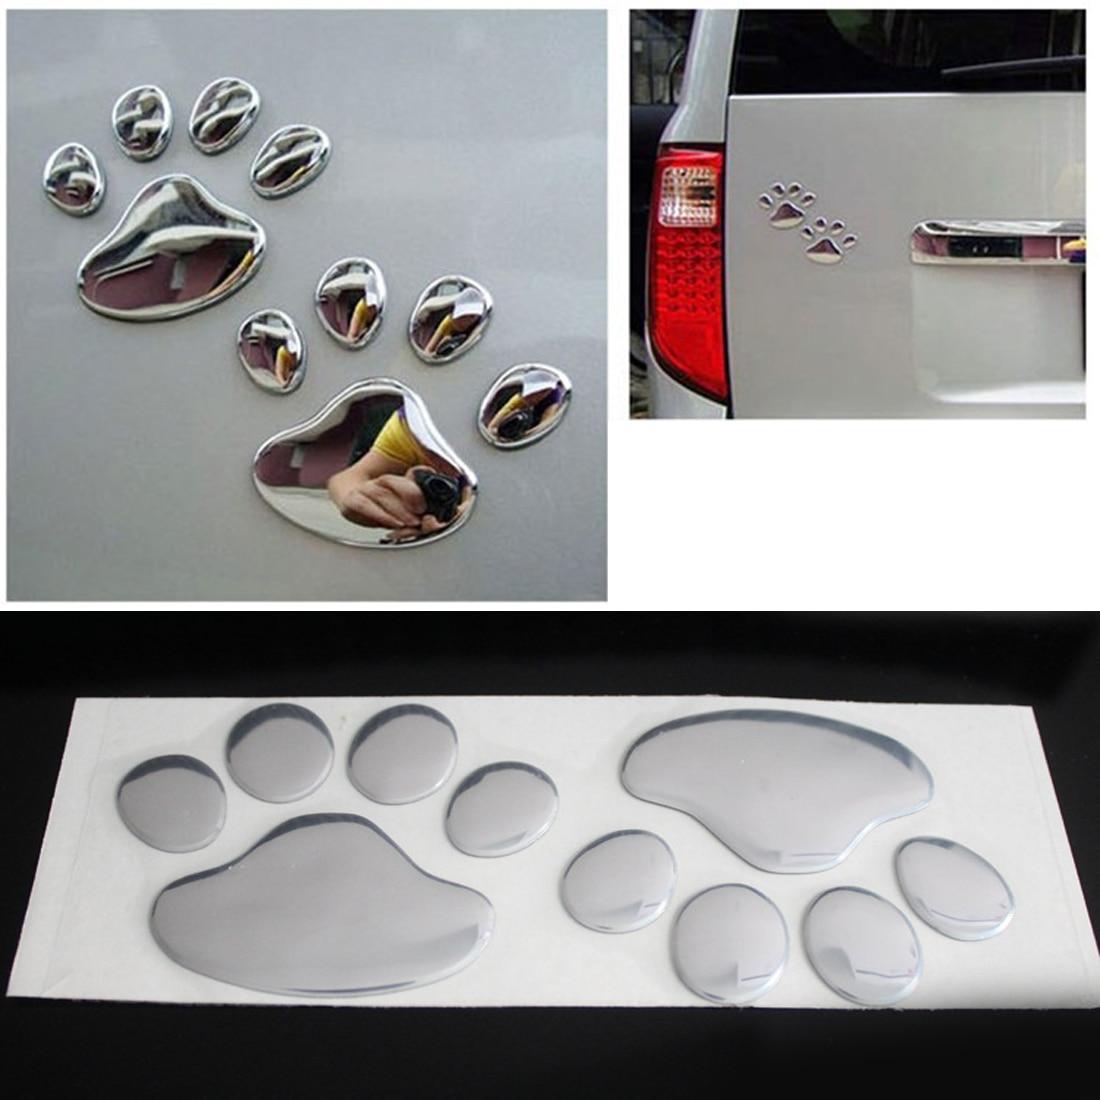 Dewtreetali Car Sticker Cool Design Paw  3D Animal Dog Cat Bear Foot Prints Footprint 3M Decal Car Stickers  Silver Gold Red Bla